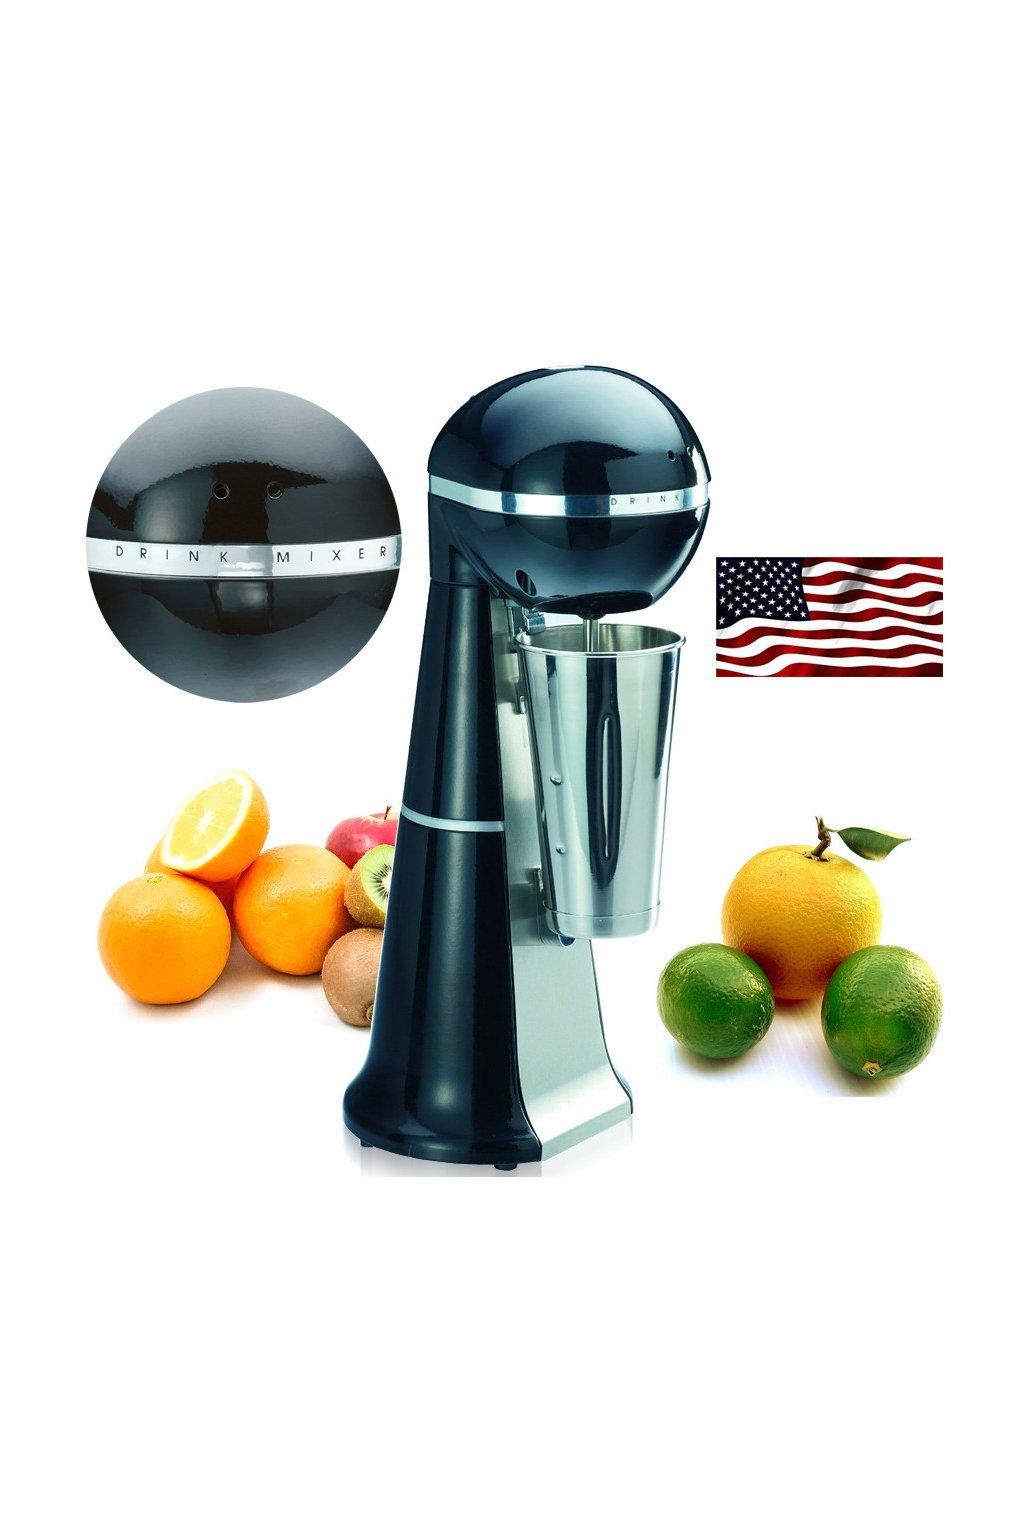 420 drink mixer gastroback 40172